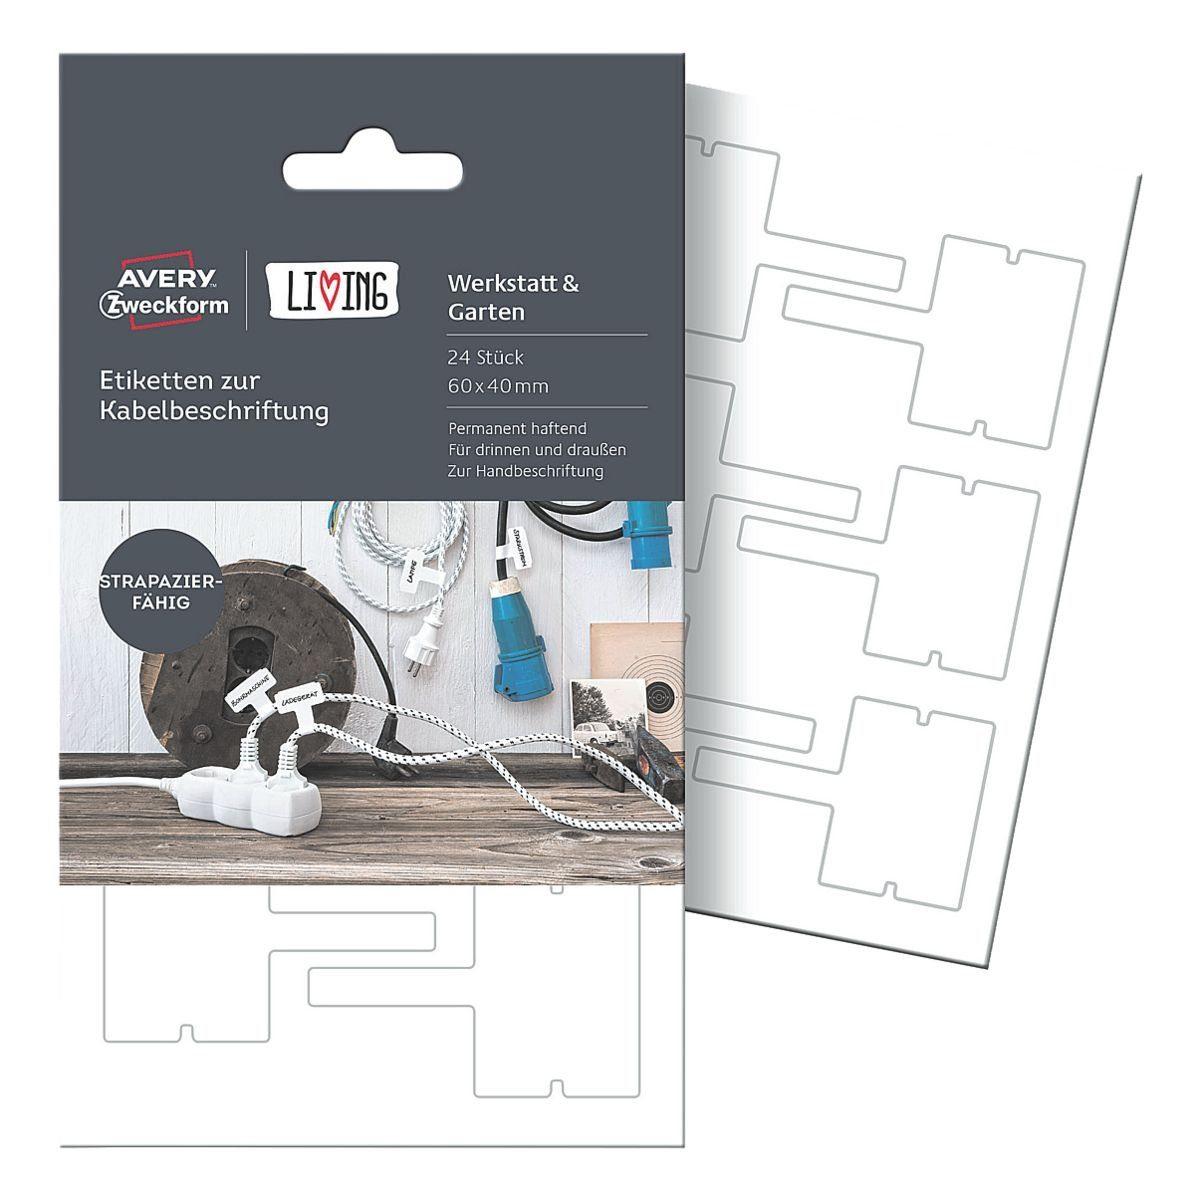 Avery Zweckform Etiketten zur Kabelbeschriftung